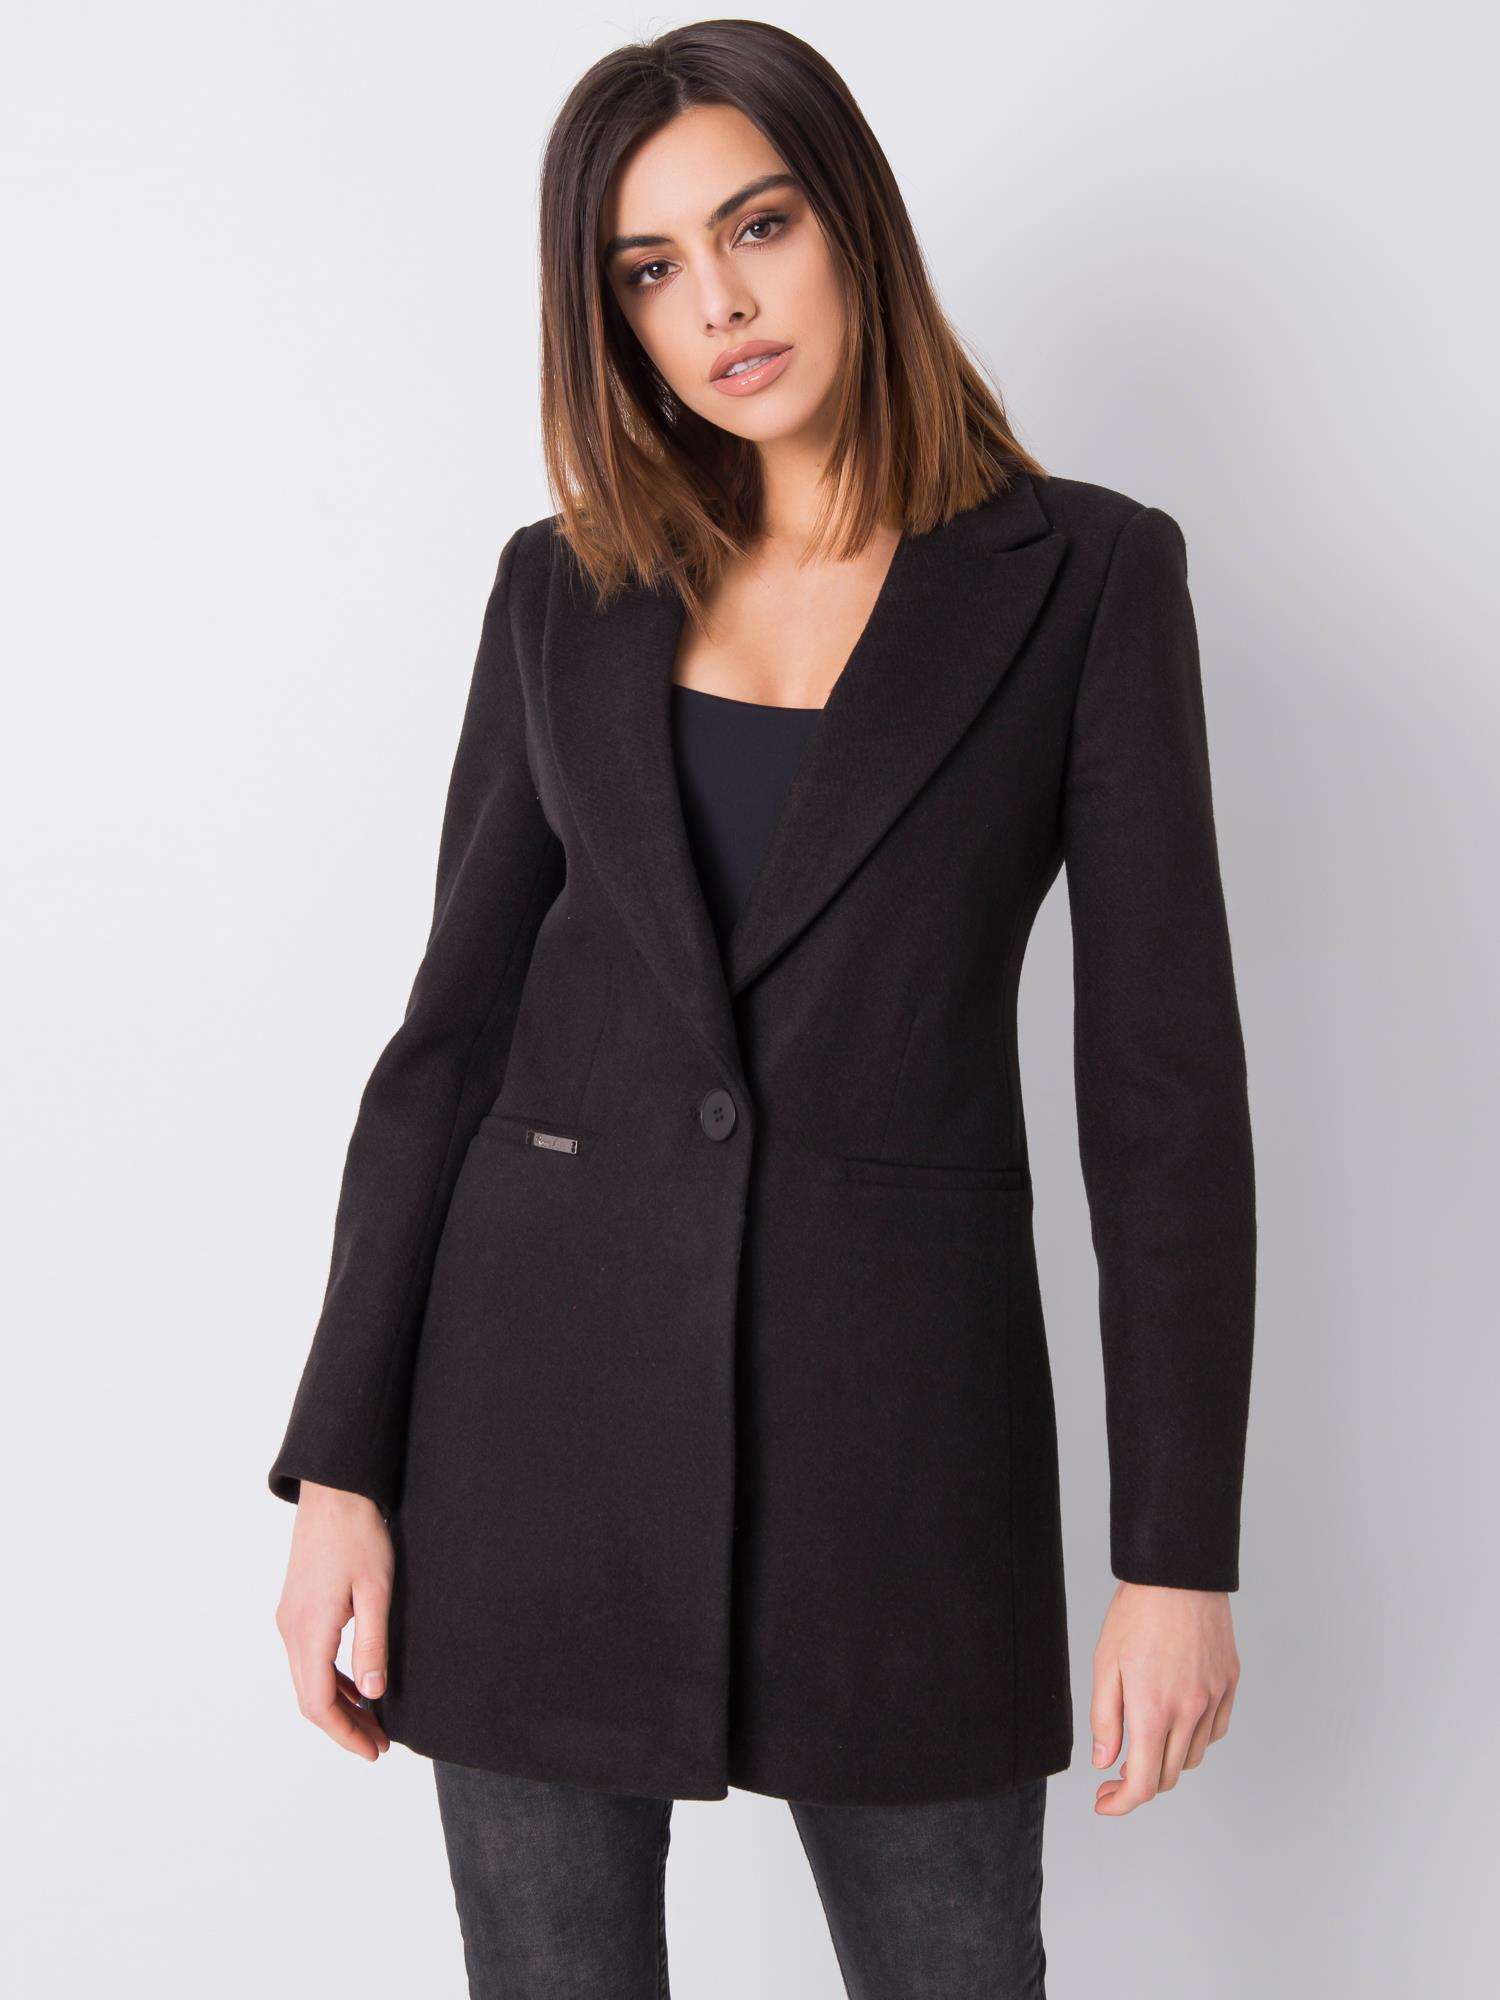 Čierny klasický dámsky kabát S